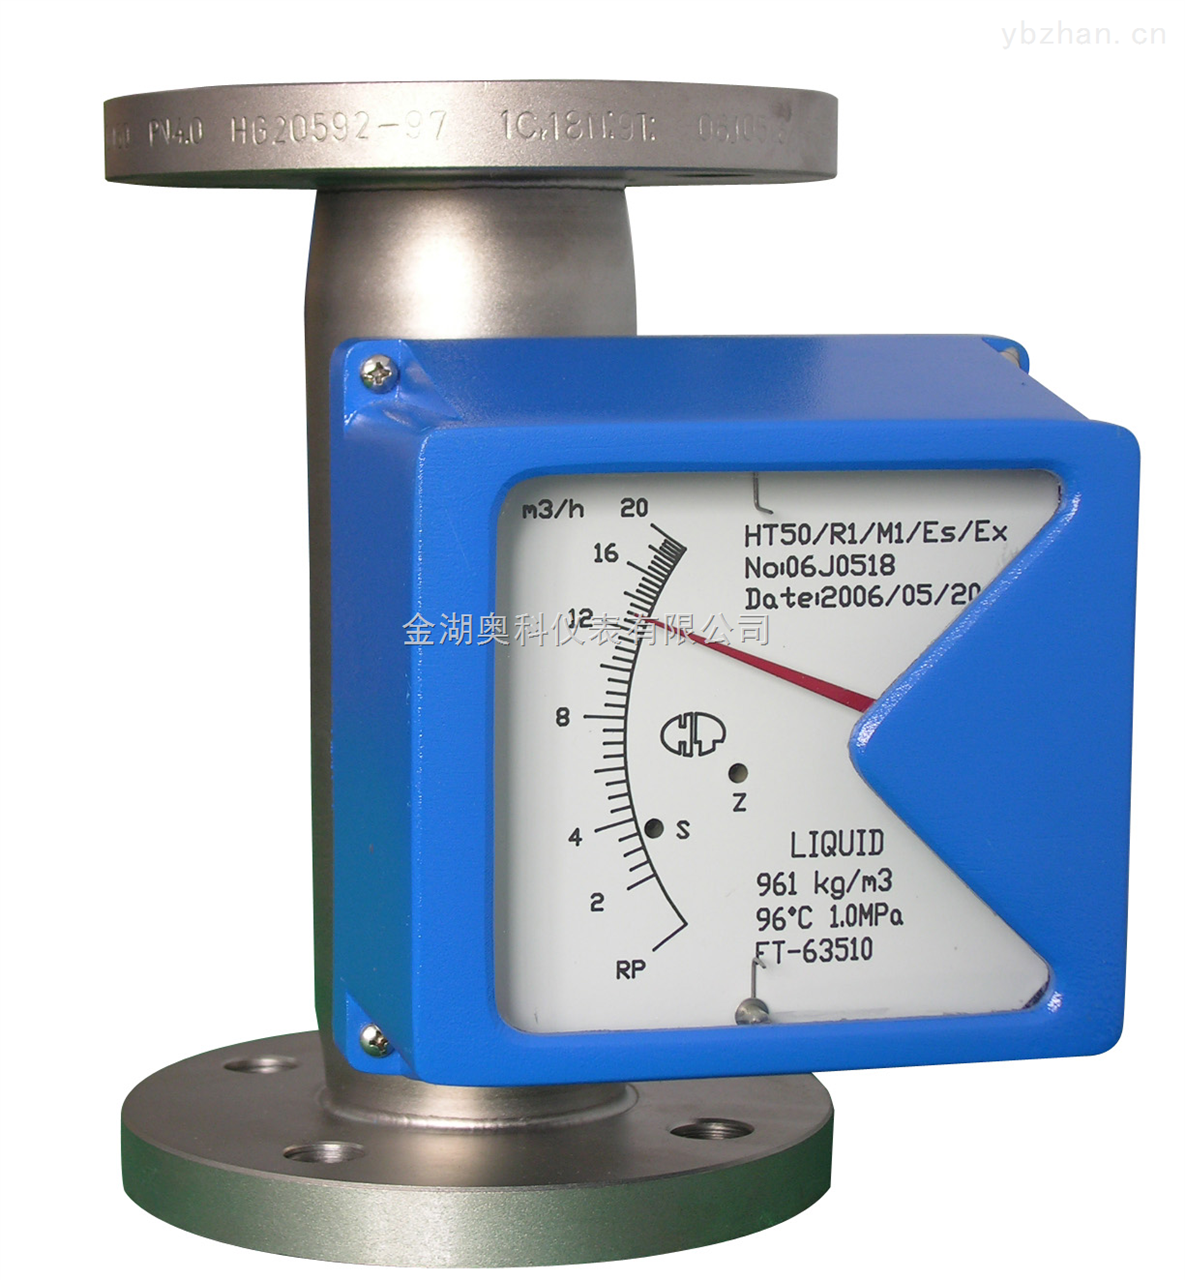 ak-lz系列 金属管浮子流量计结构简单,工作可靠,准确度高